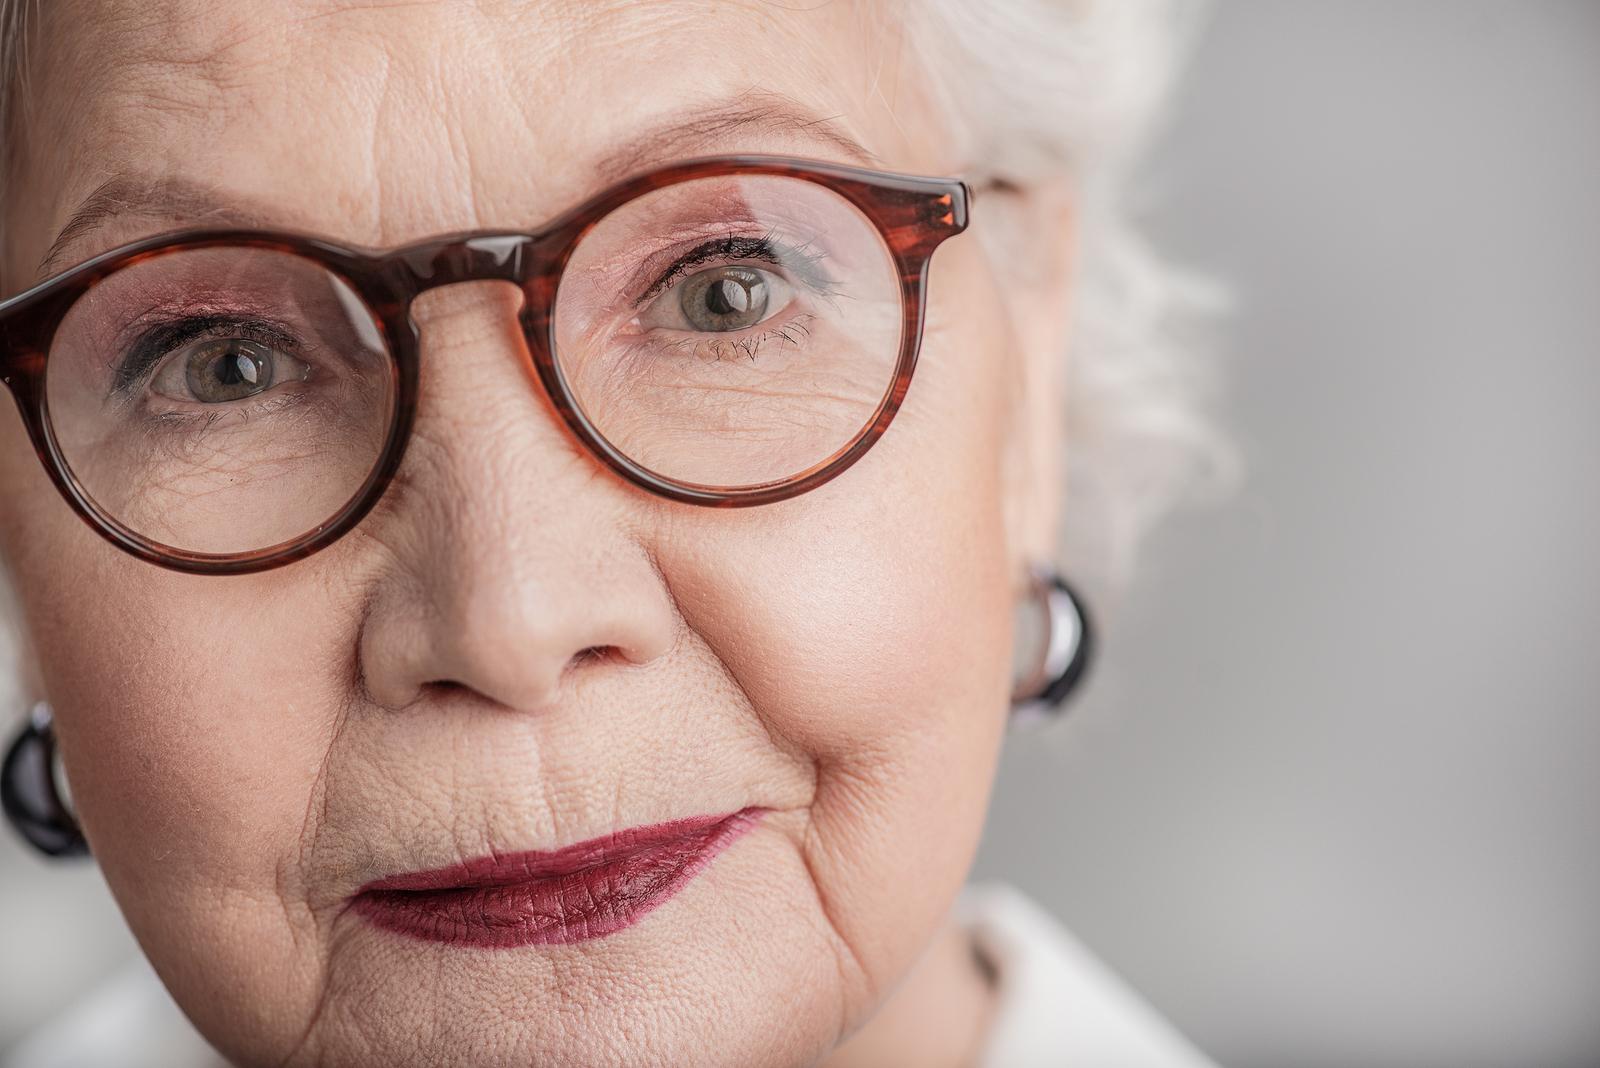 Home Health Care in Enterprise AL: Senior Dementia